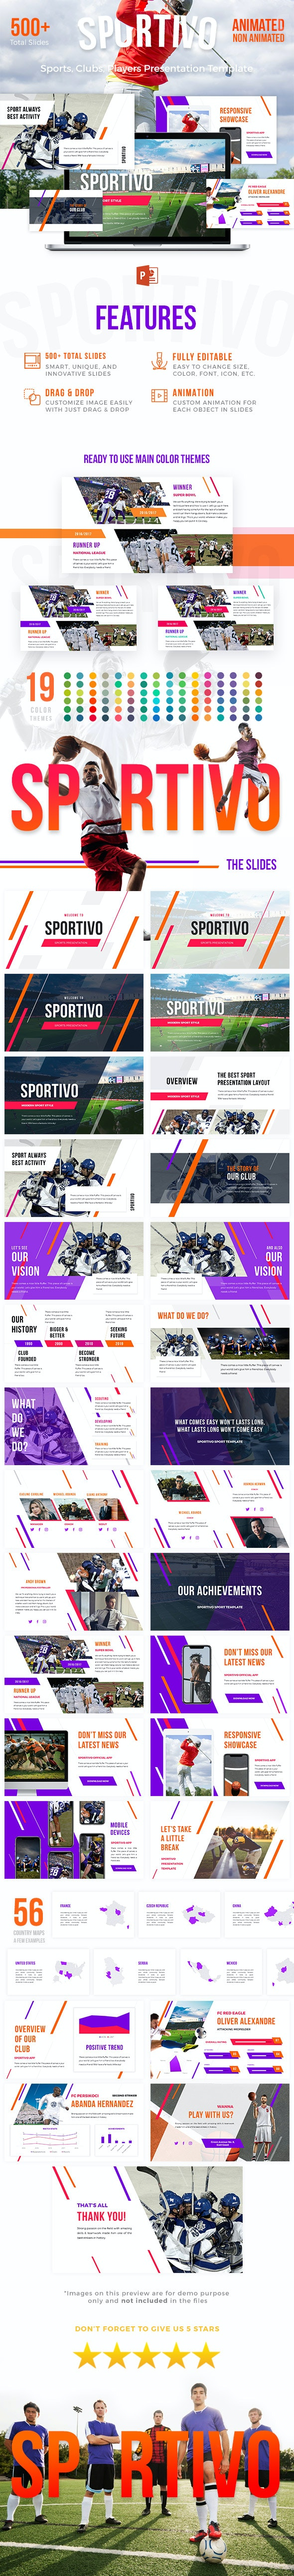 Sport Powerpoint Template - Sportivo - PowerPoint Templates Presentation Templates